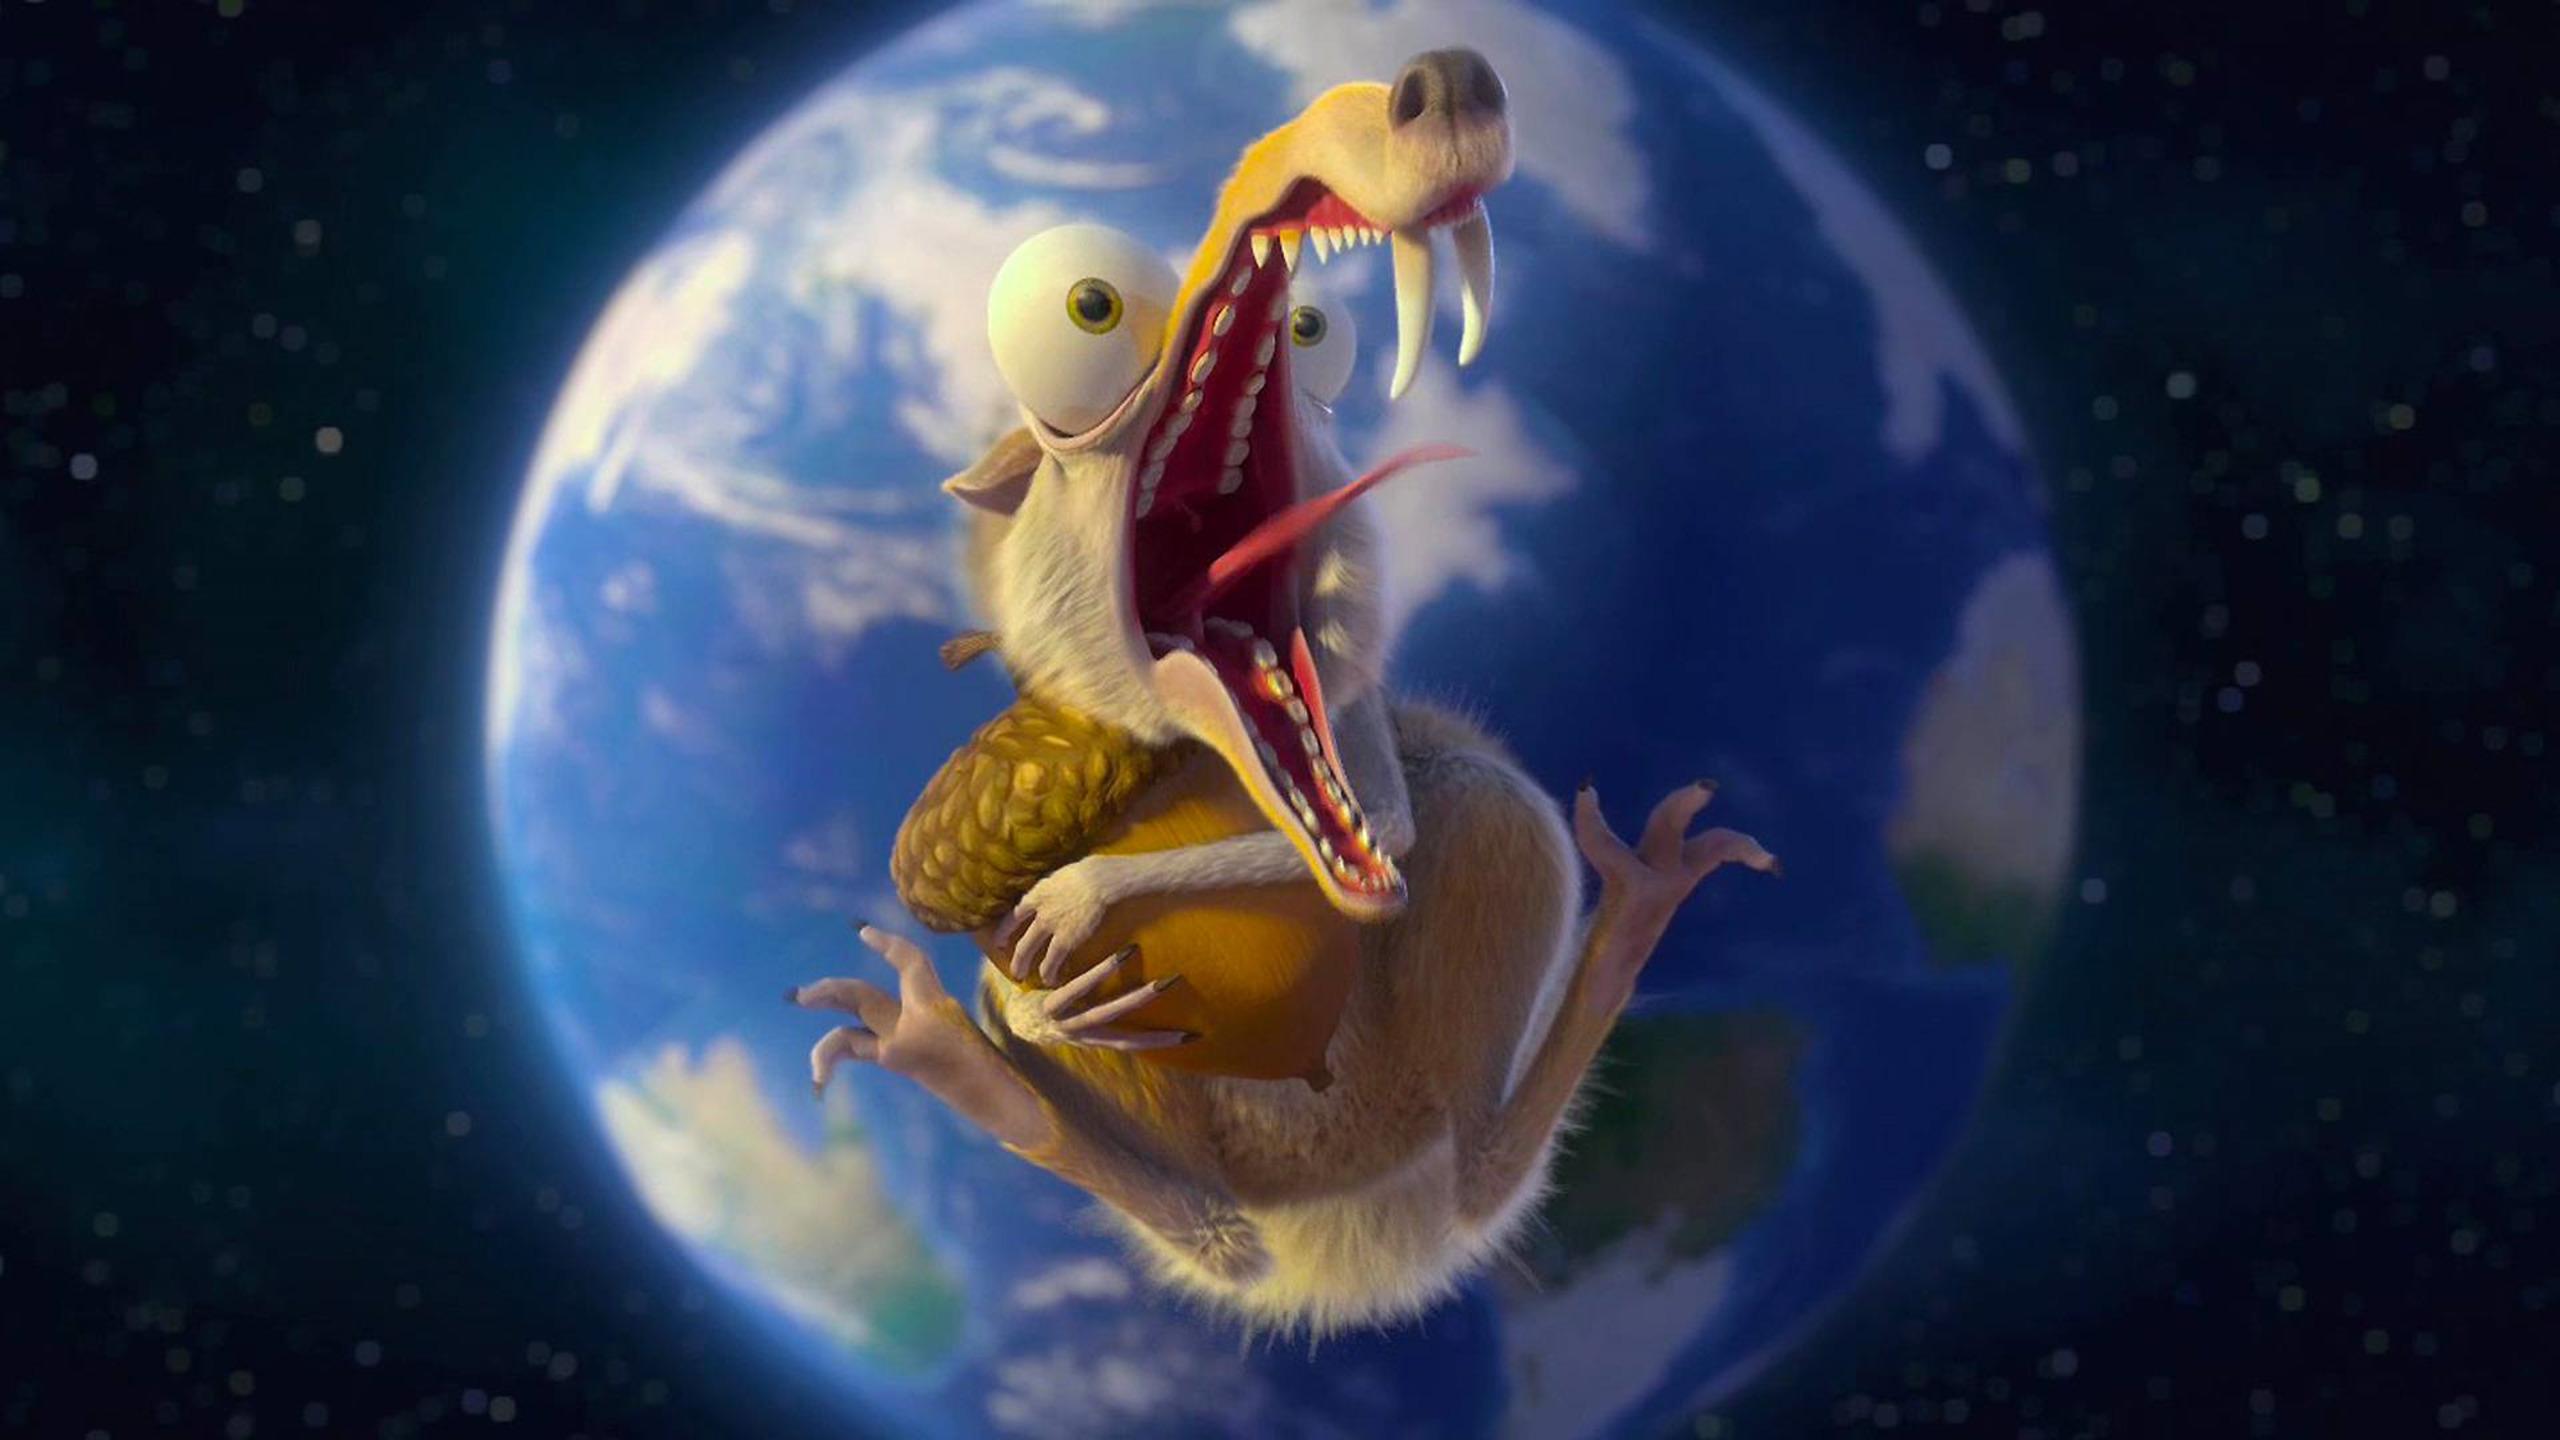 2560x1440 Ice Age 5 Animated Movie 1440p Resolution Hd 4k